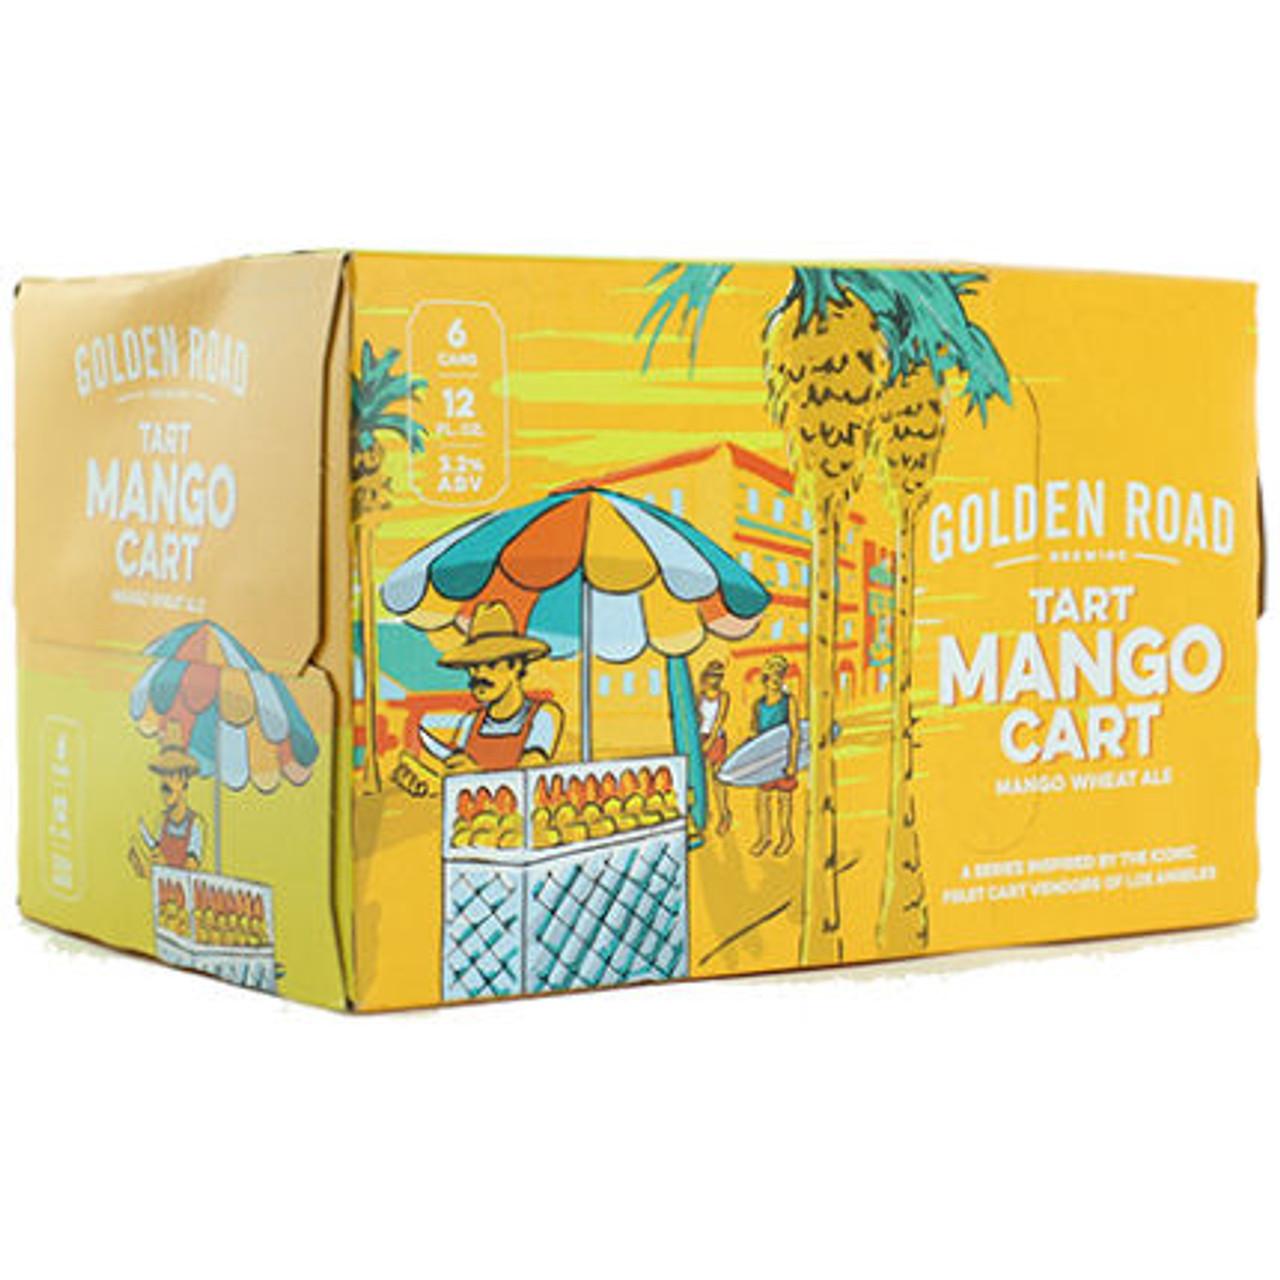 Golden Road Mango Cart Tart Wheat Ale 12oz 6 Pack Cans